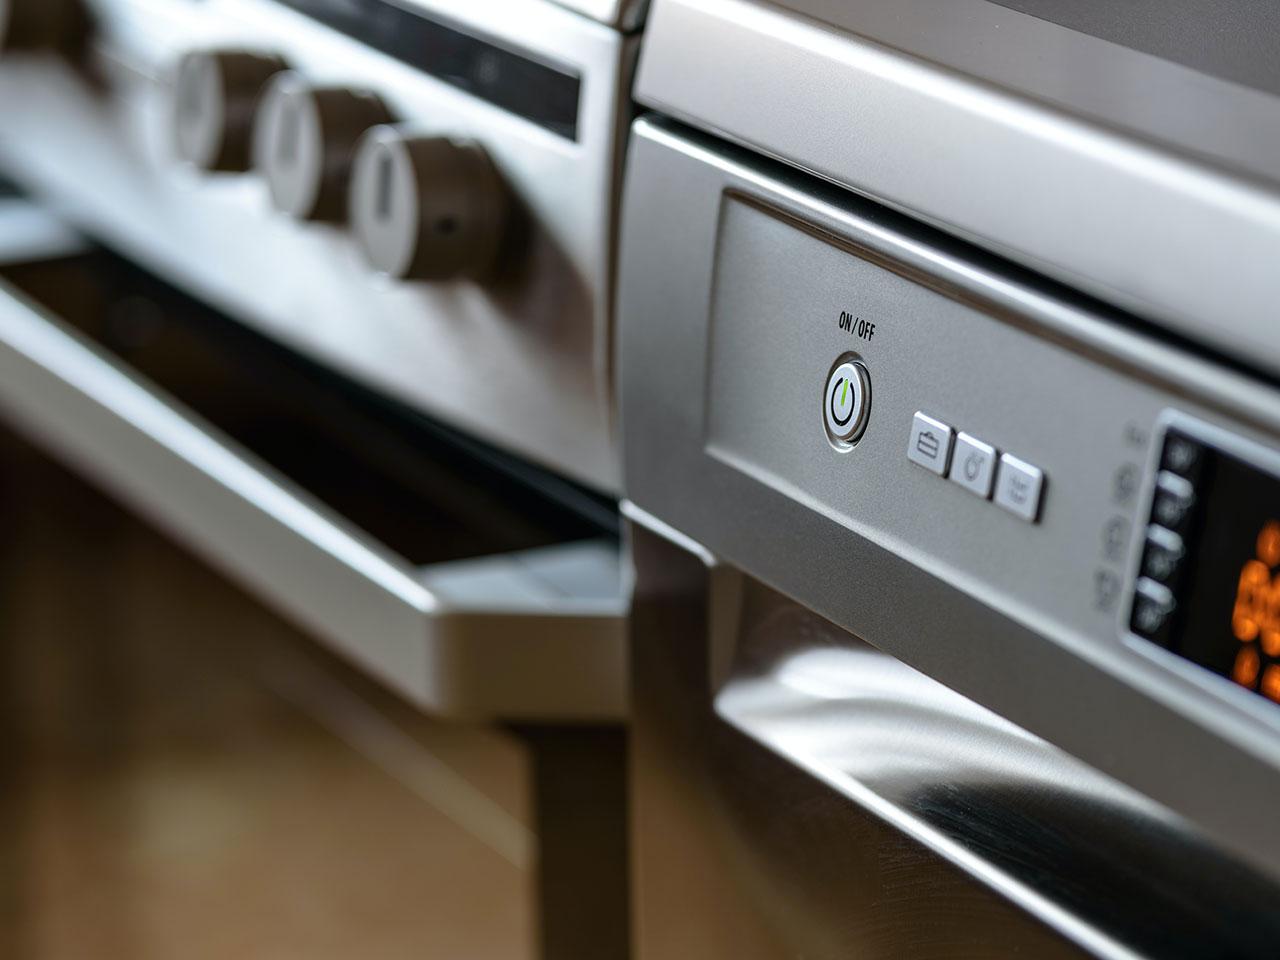 gray gas range oven in kitchen